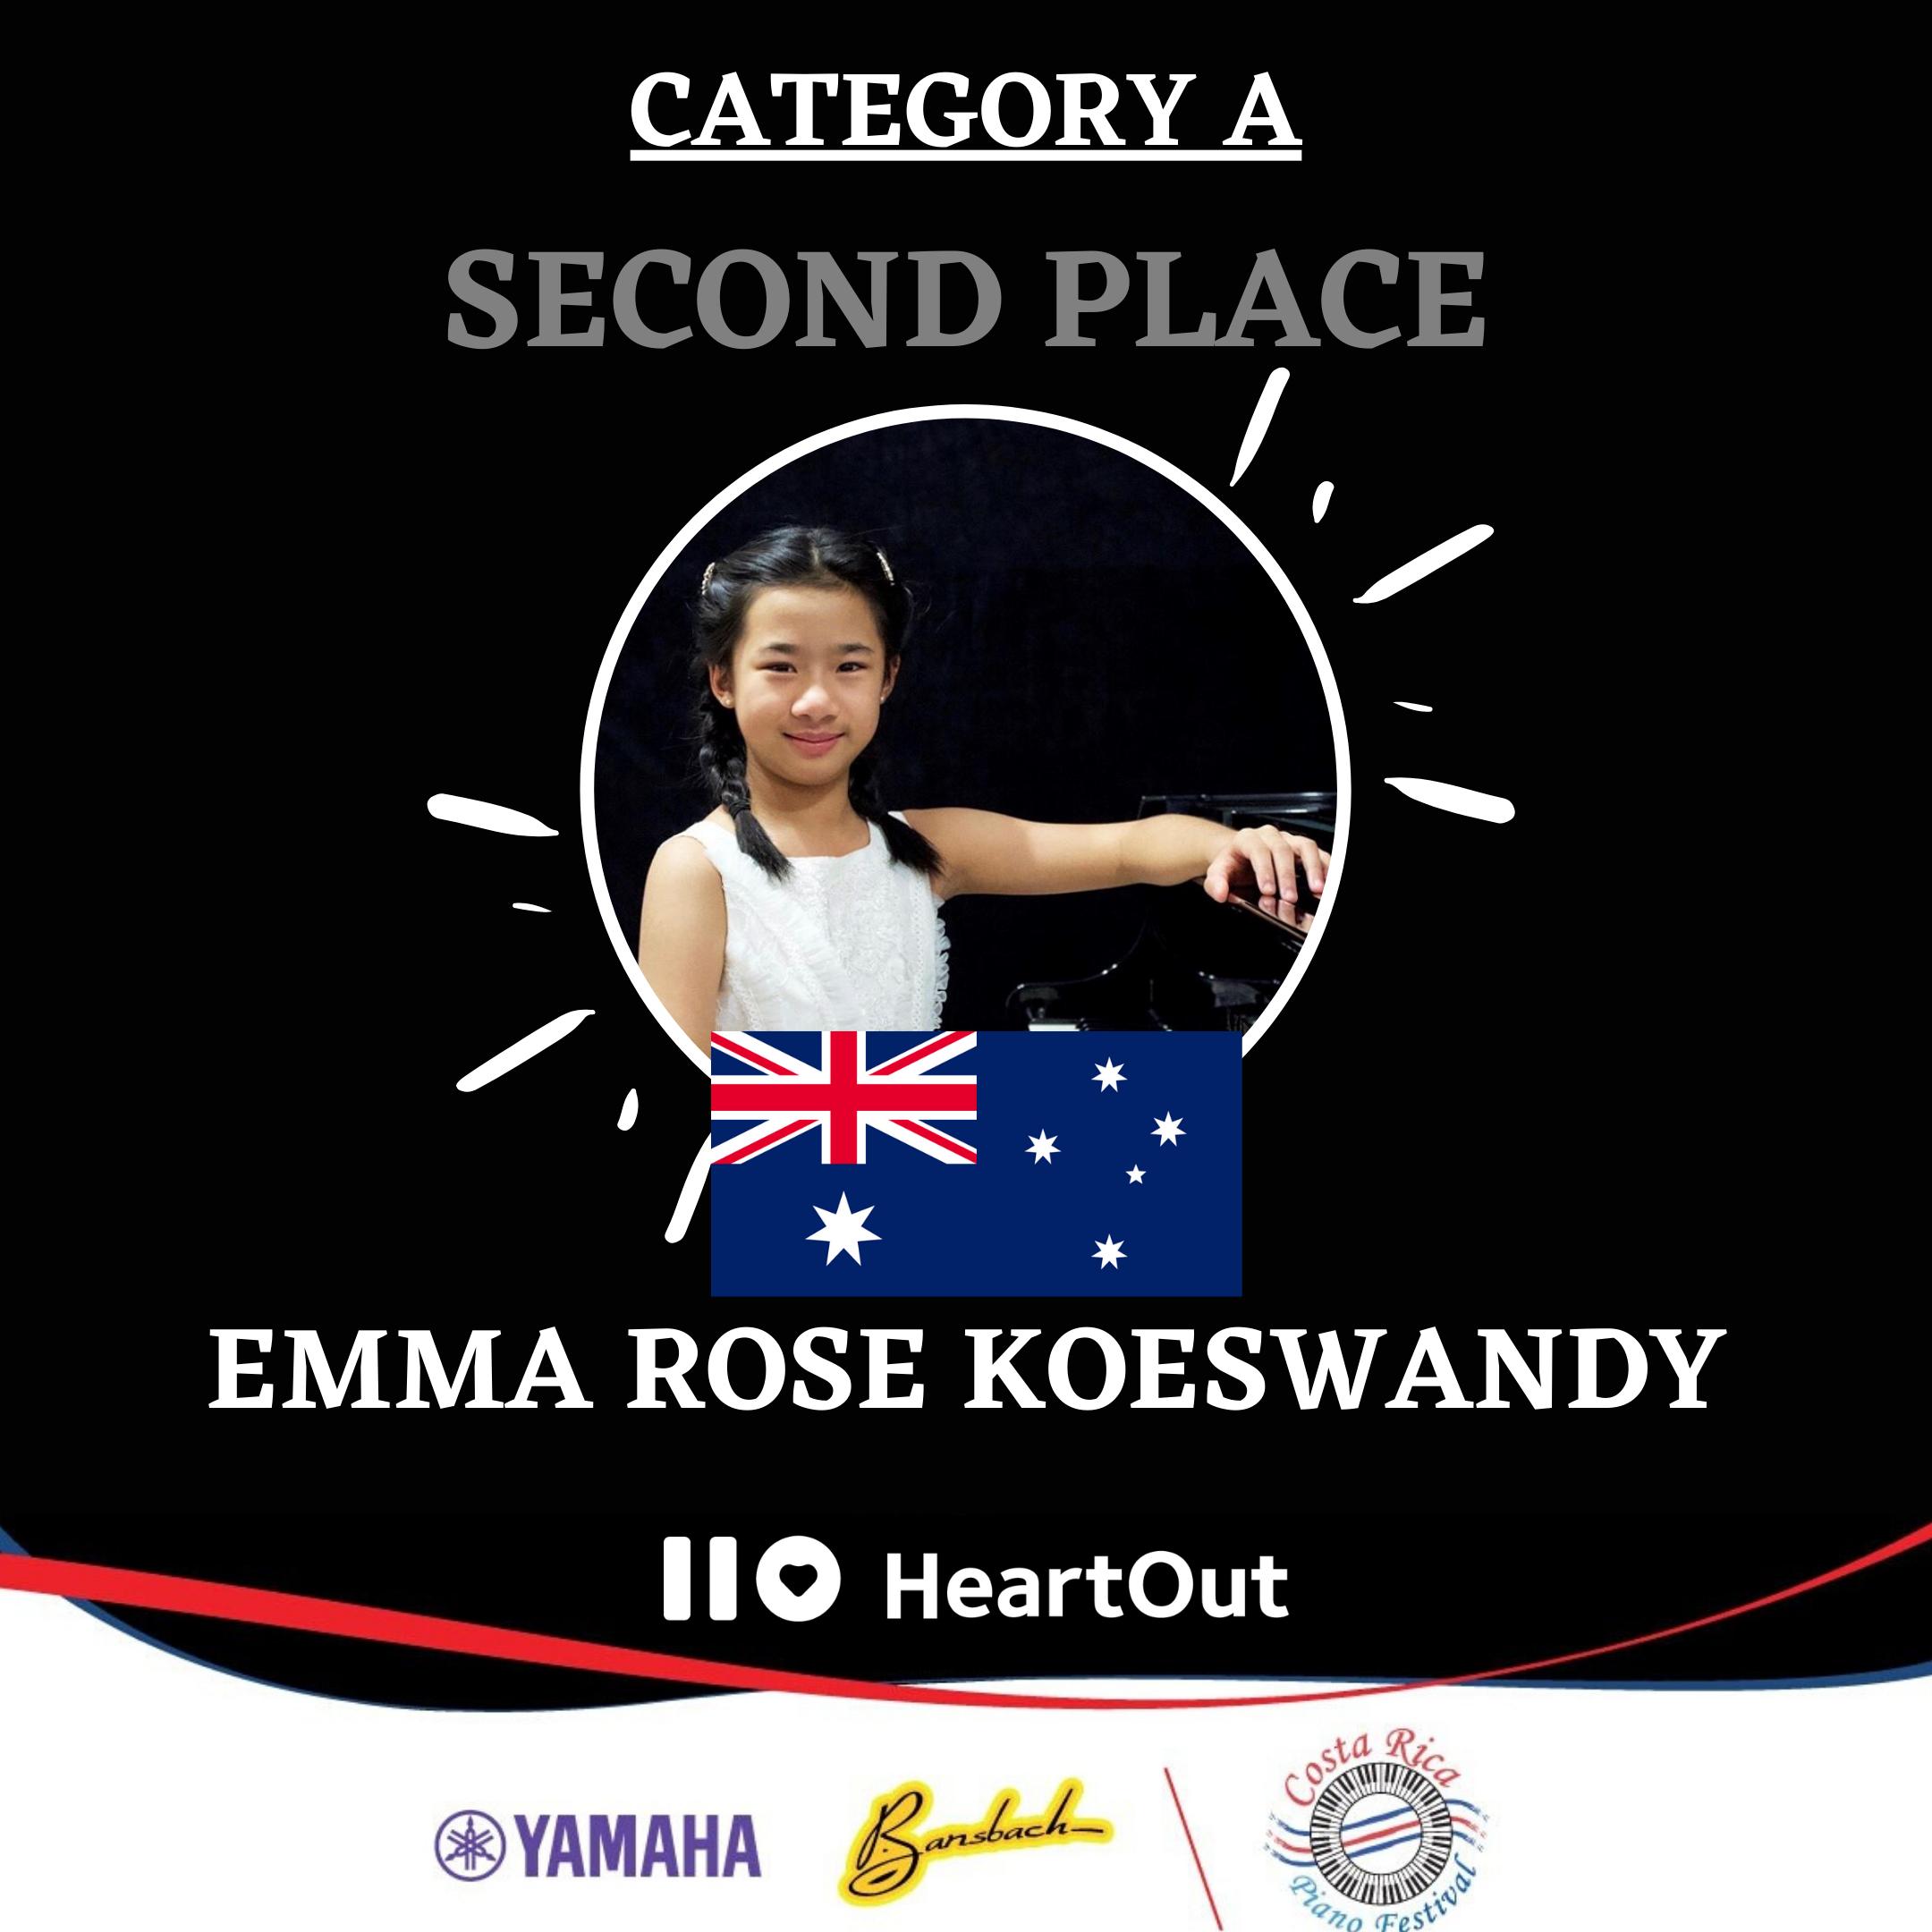 CRPF Emma Koeswandy